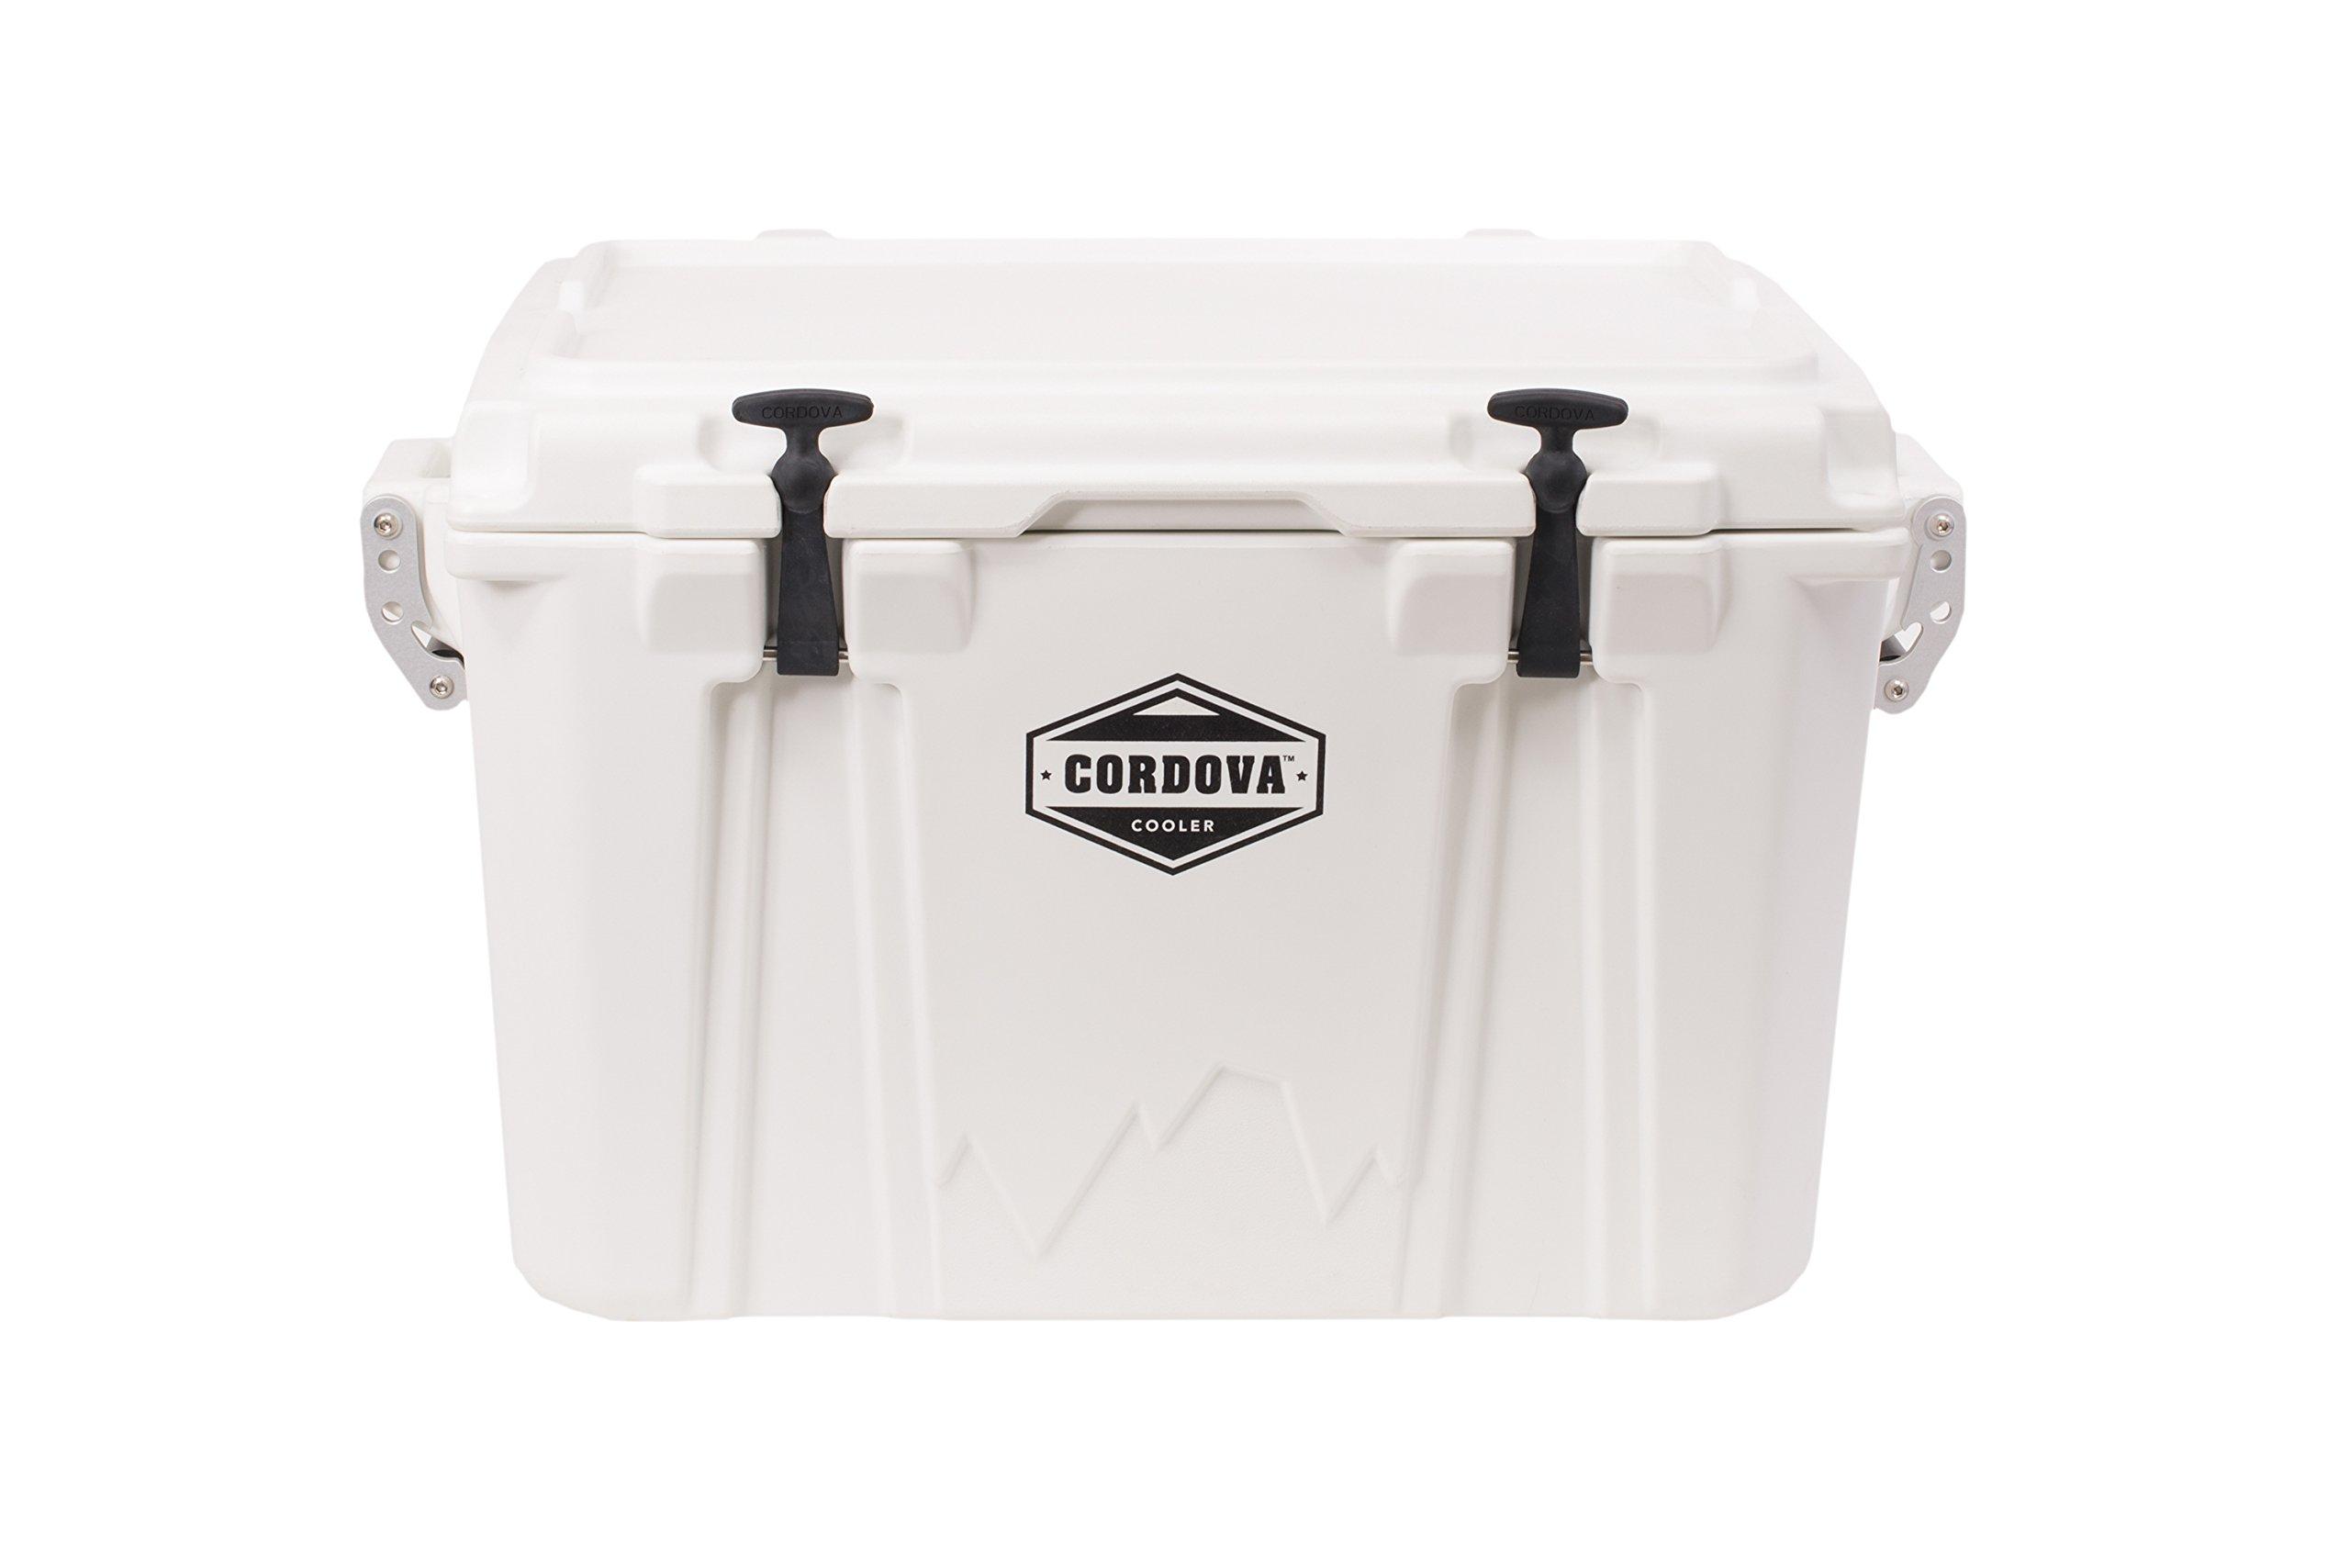 Cordova Coolers 50 Medium Cooler - White by Cordova Coolers